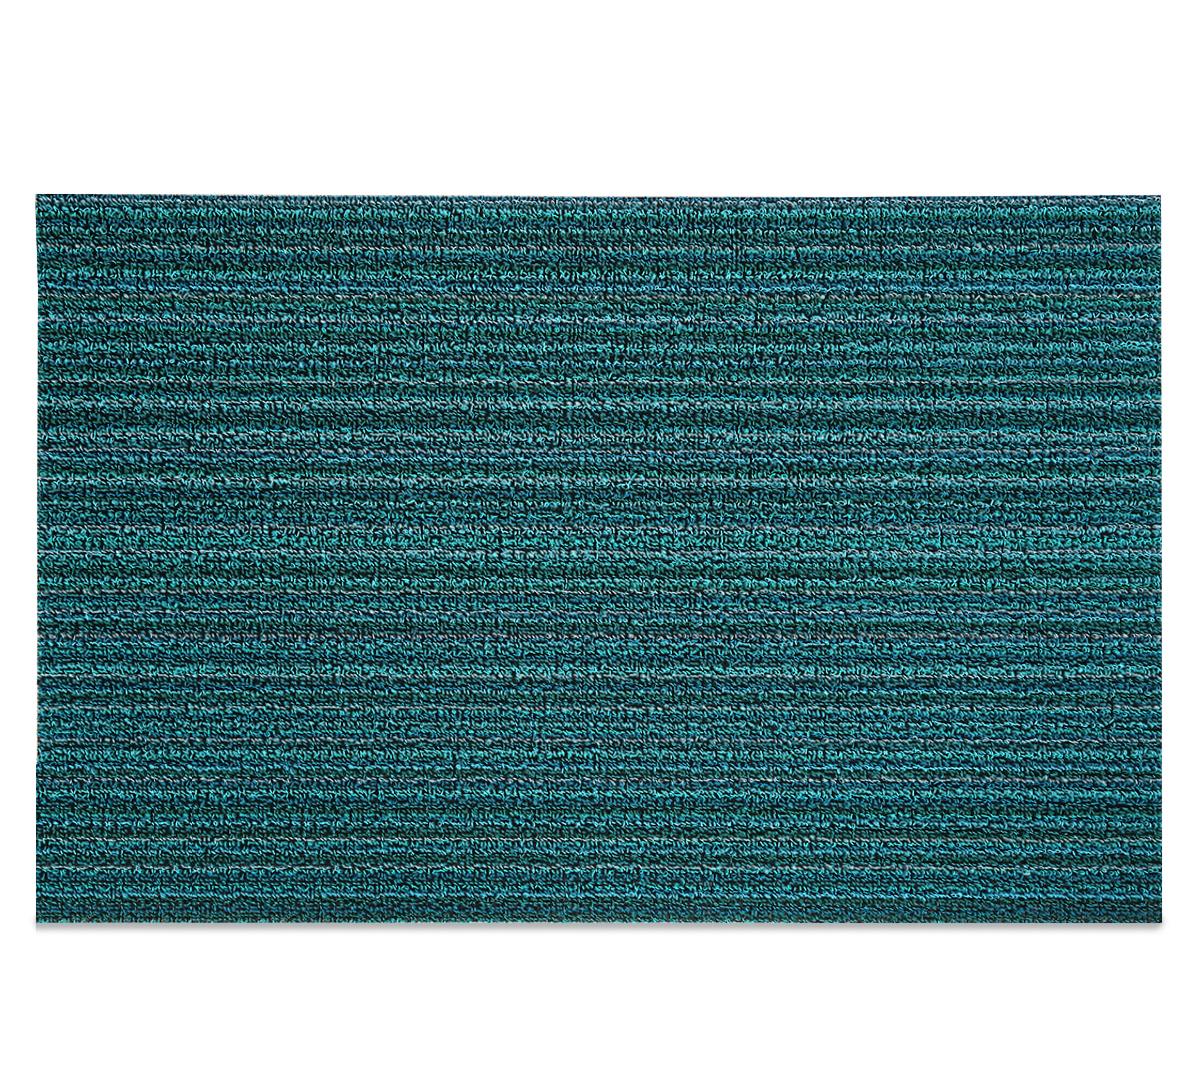 Chil ShagSkinnyDoormat Turquoise46x71cm